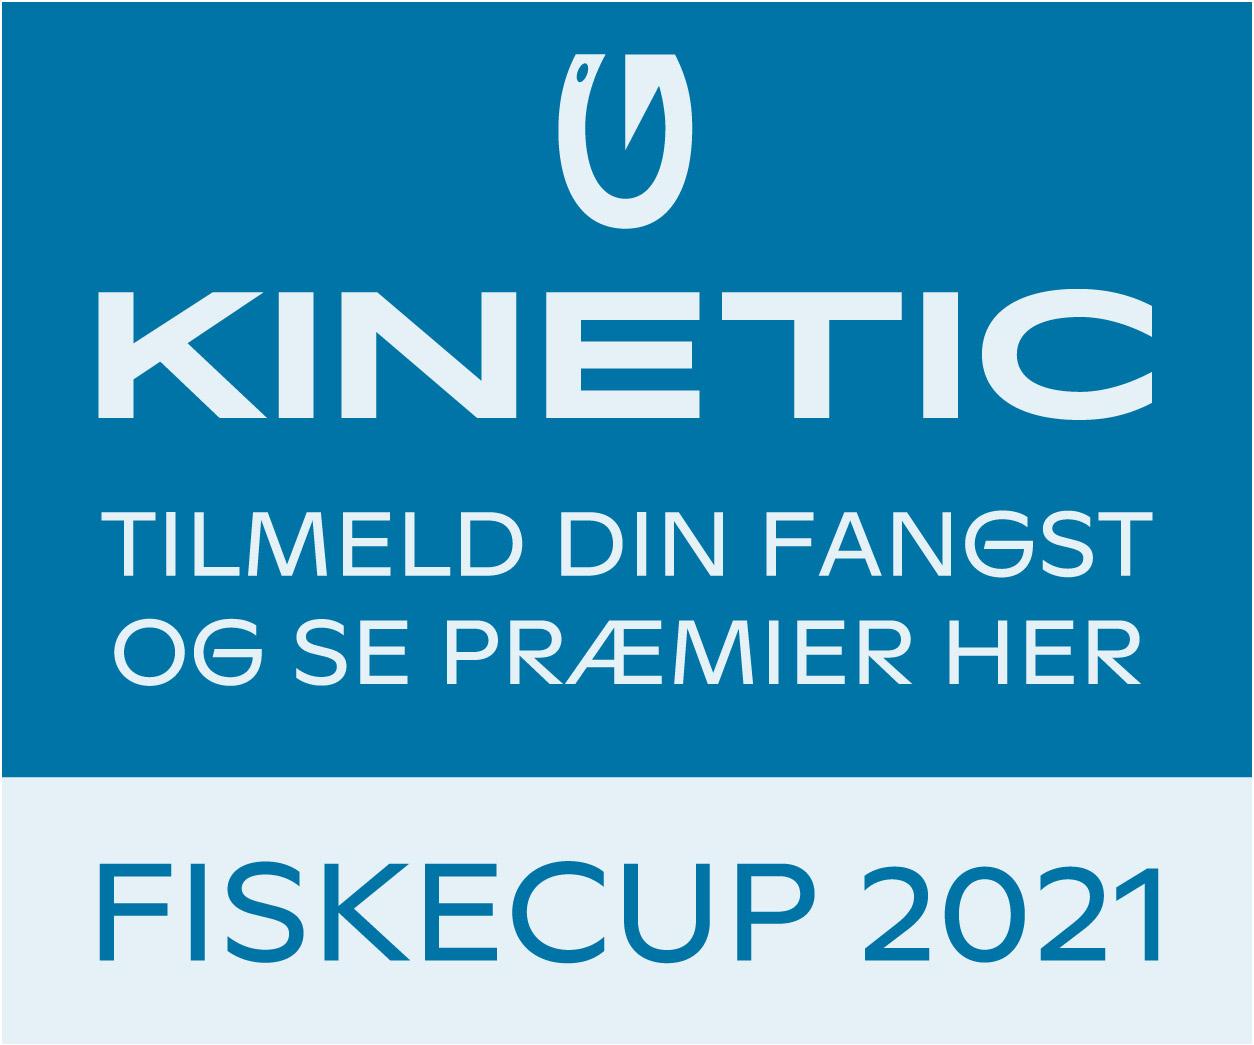 Kinetic Fiskecup 2021